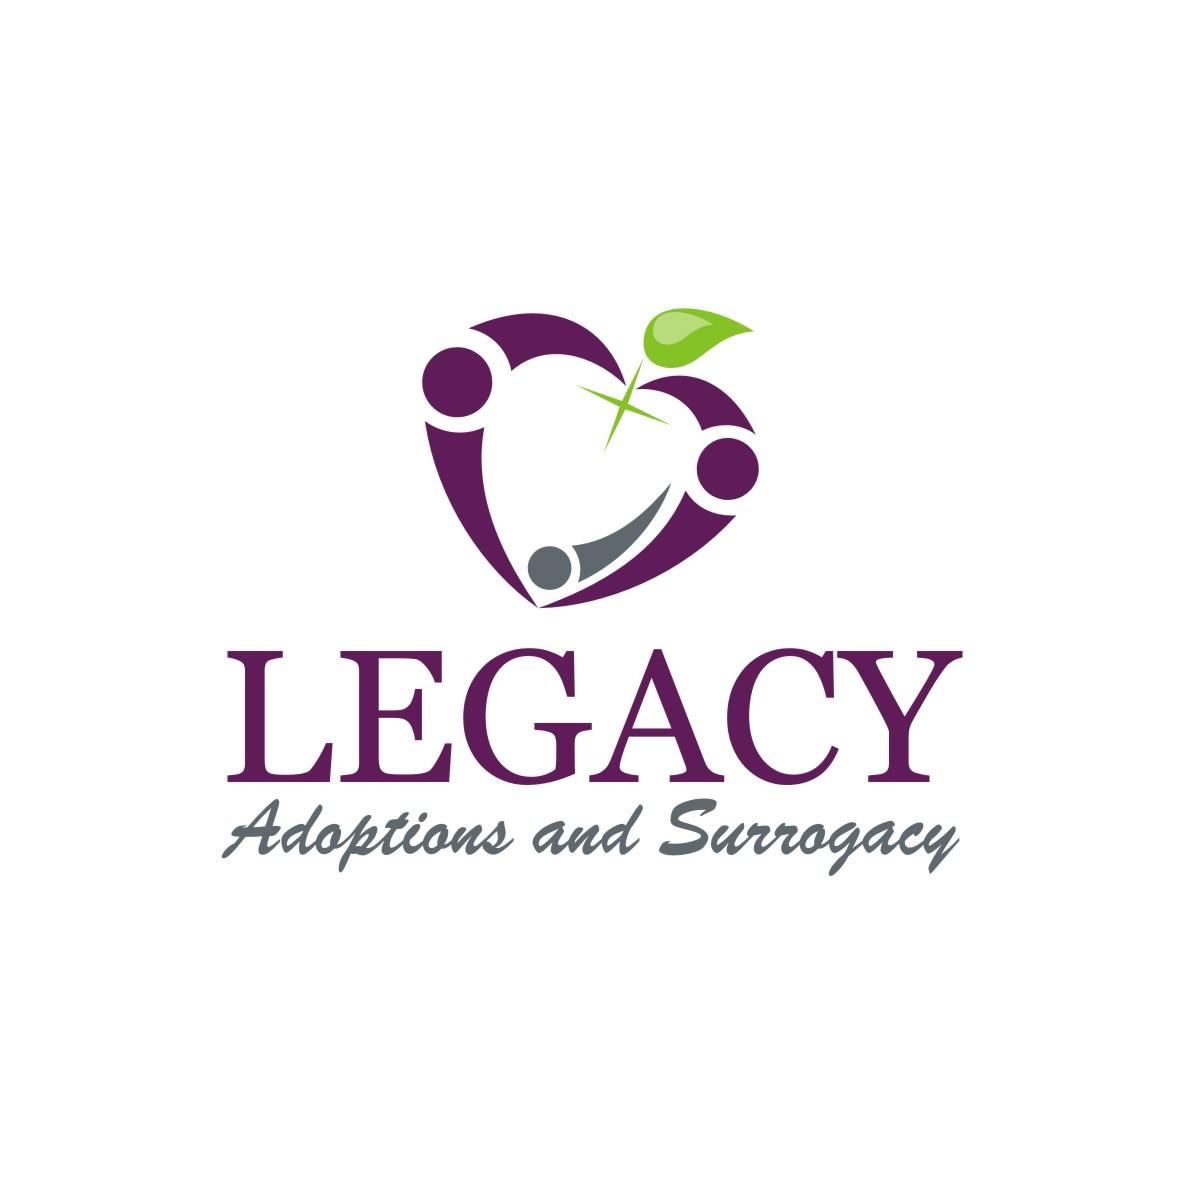 Logo Design by arteo_design - Entry No. 113 in the Logo Design Contest Legacy Adoptions and Surrogacy Logo Design.